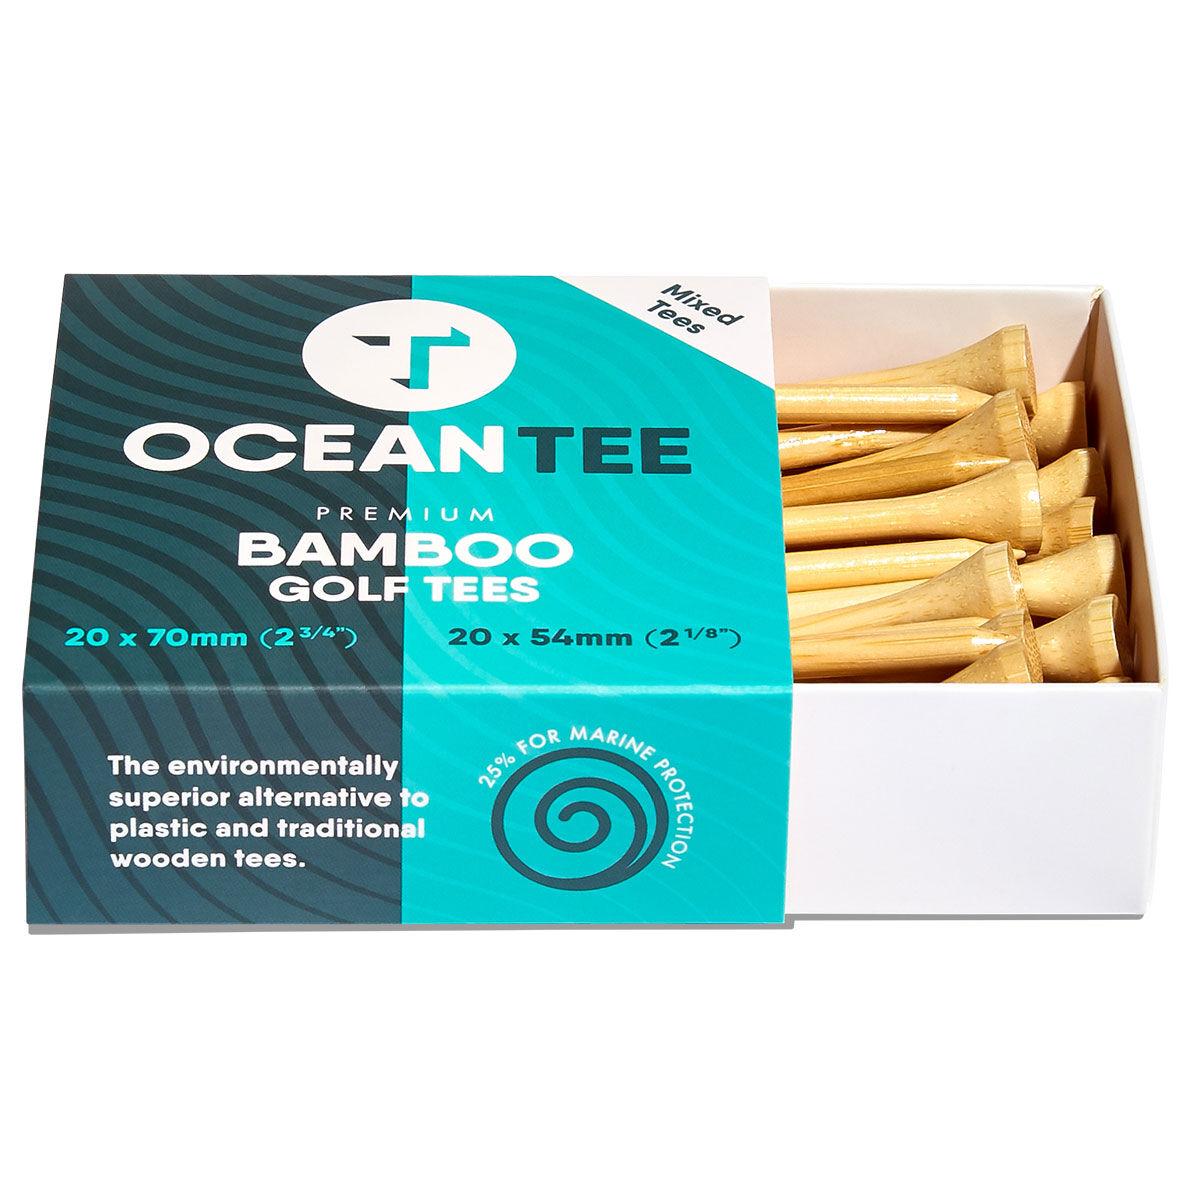 Ocean Tee Brown 54mm & 70mm Pack of 40 Bamboo Tees, One Size | American Golf